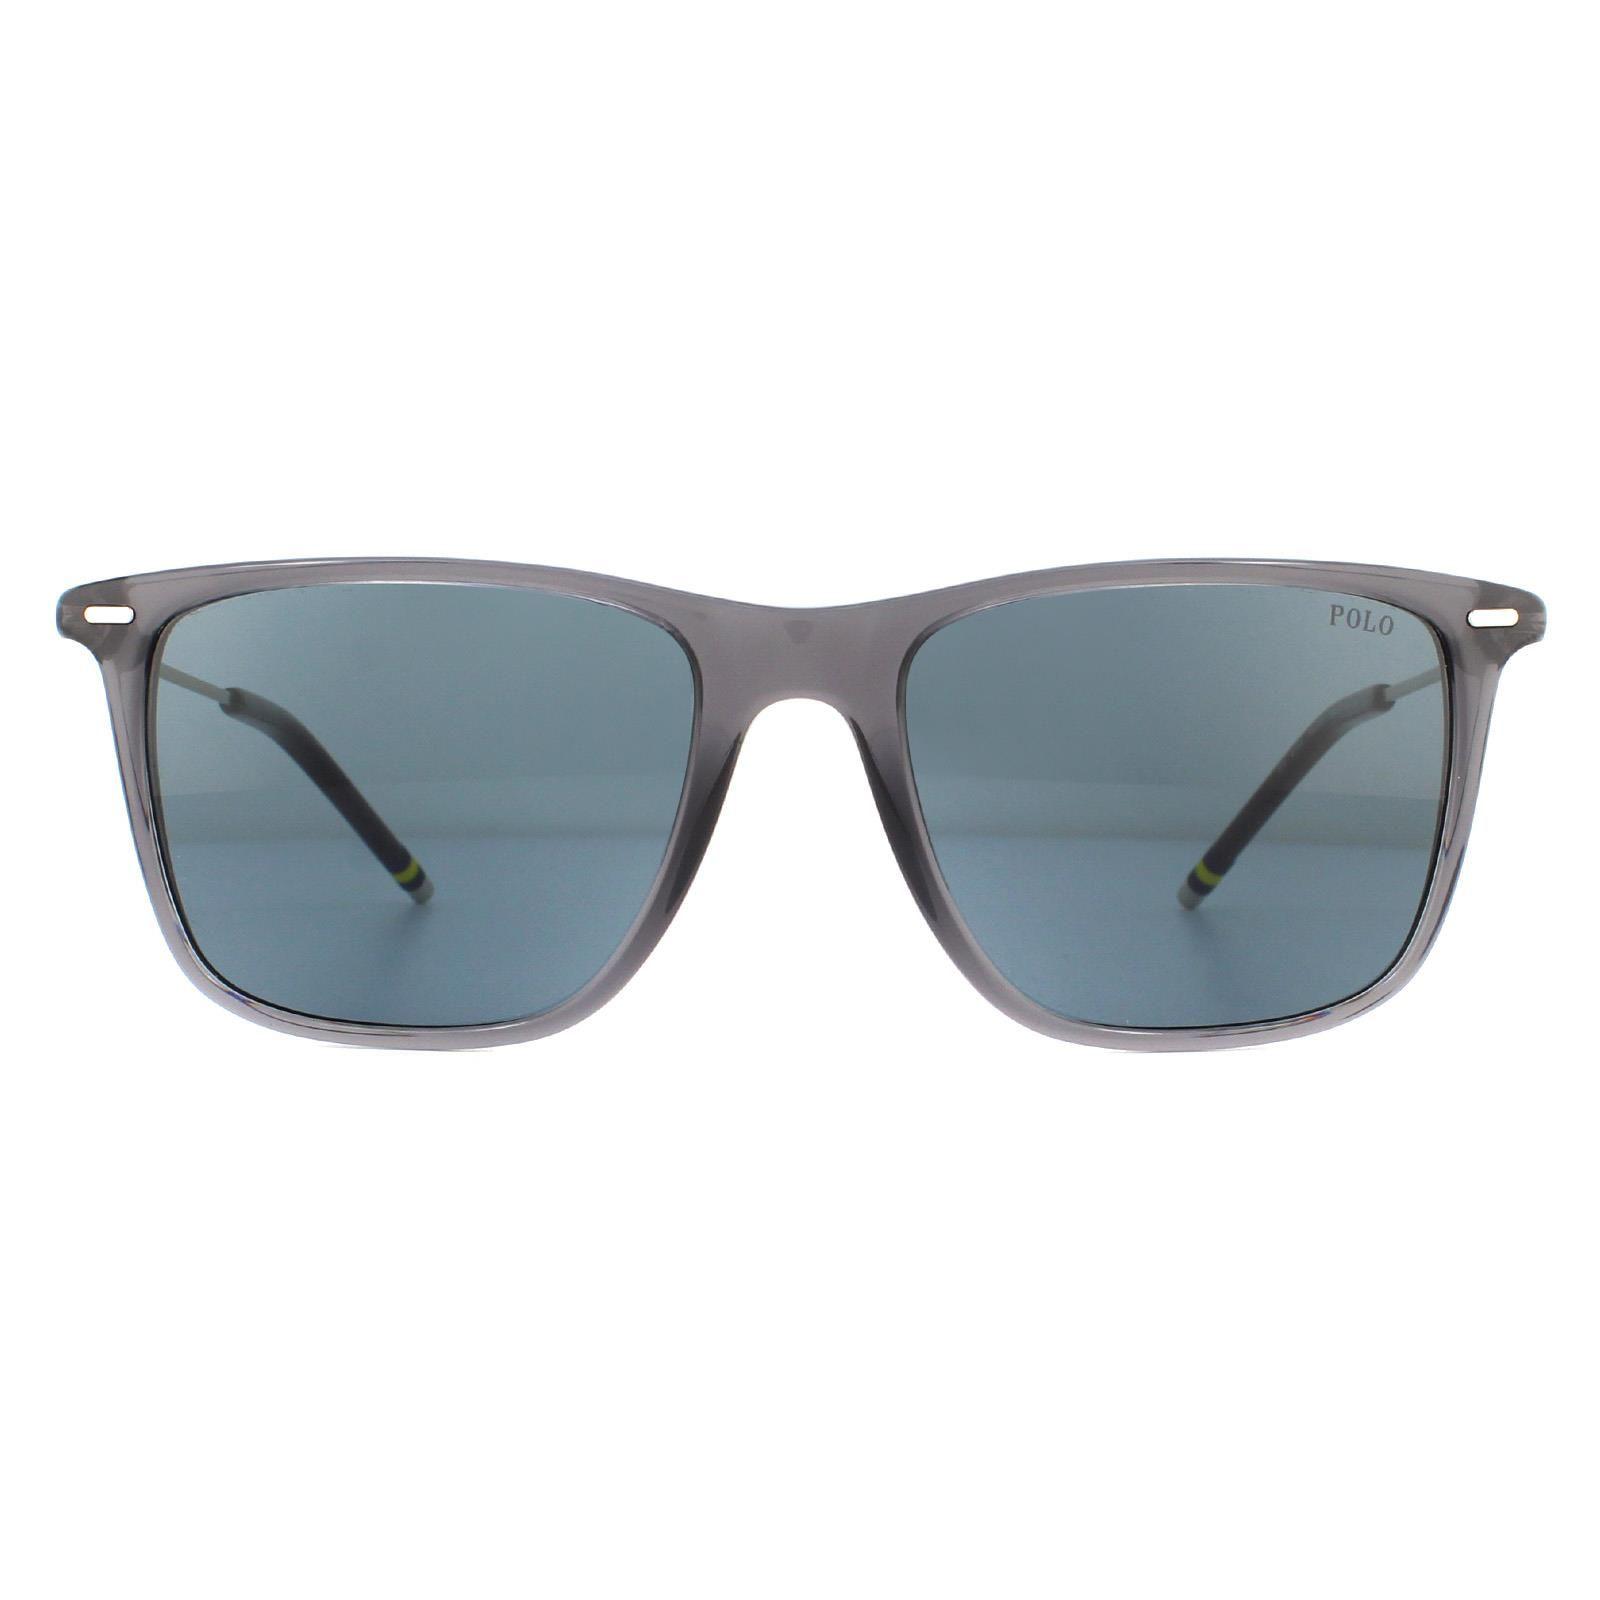 Polo Ralph Lauren Sunglasses PH4163 532087 Transparent Shiny Grey Grey